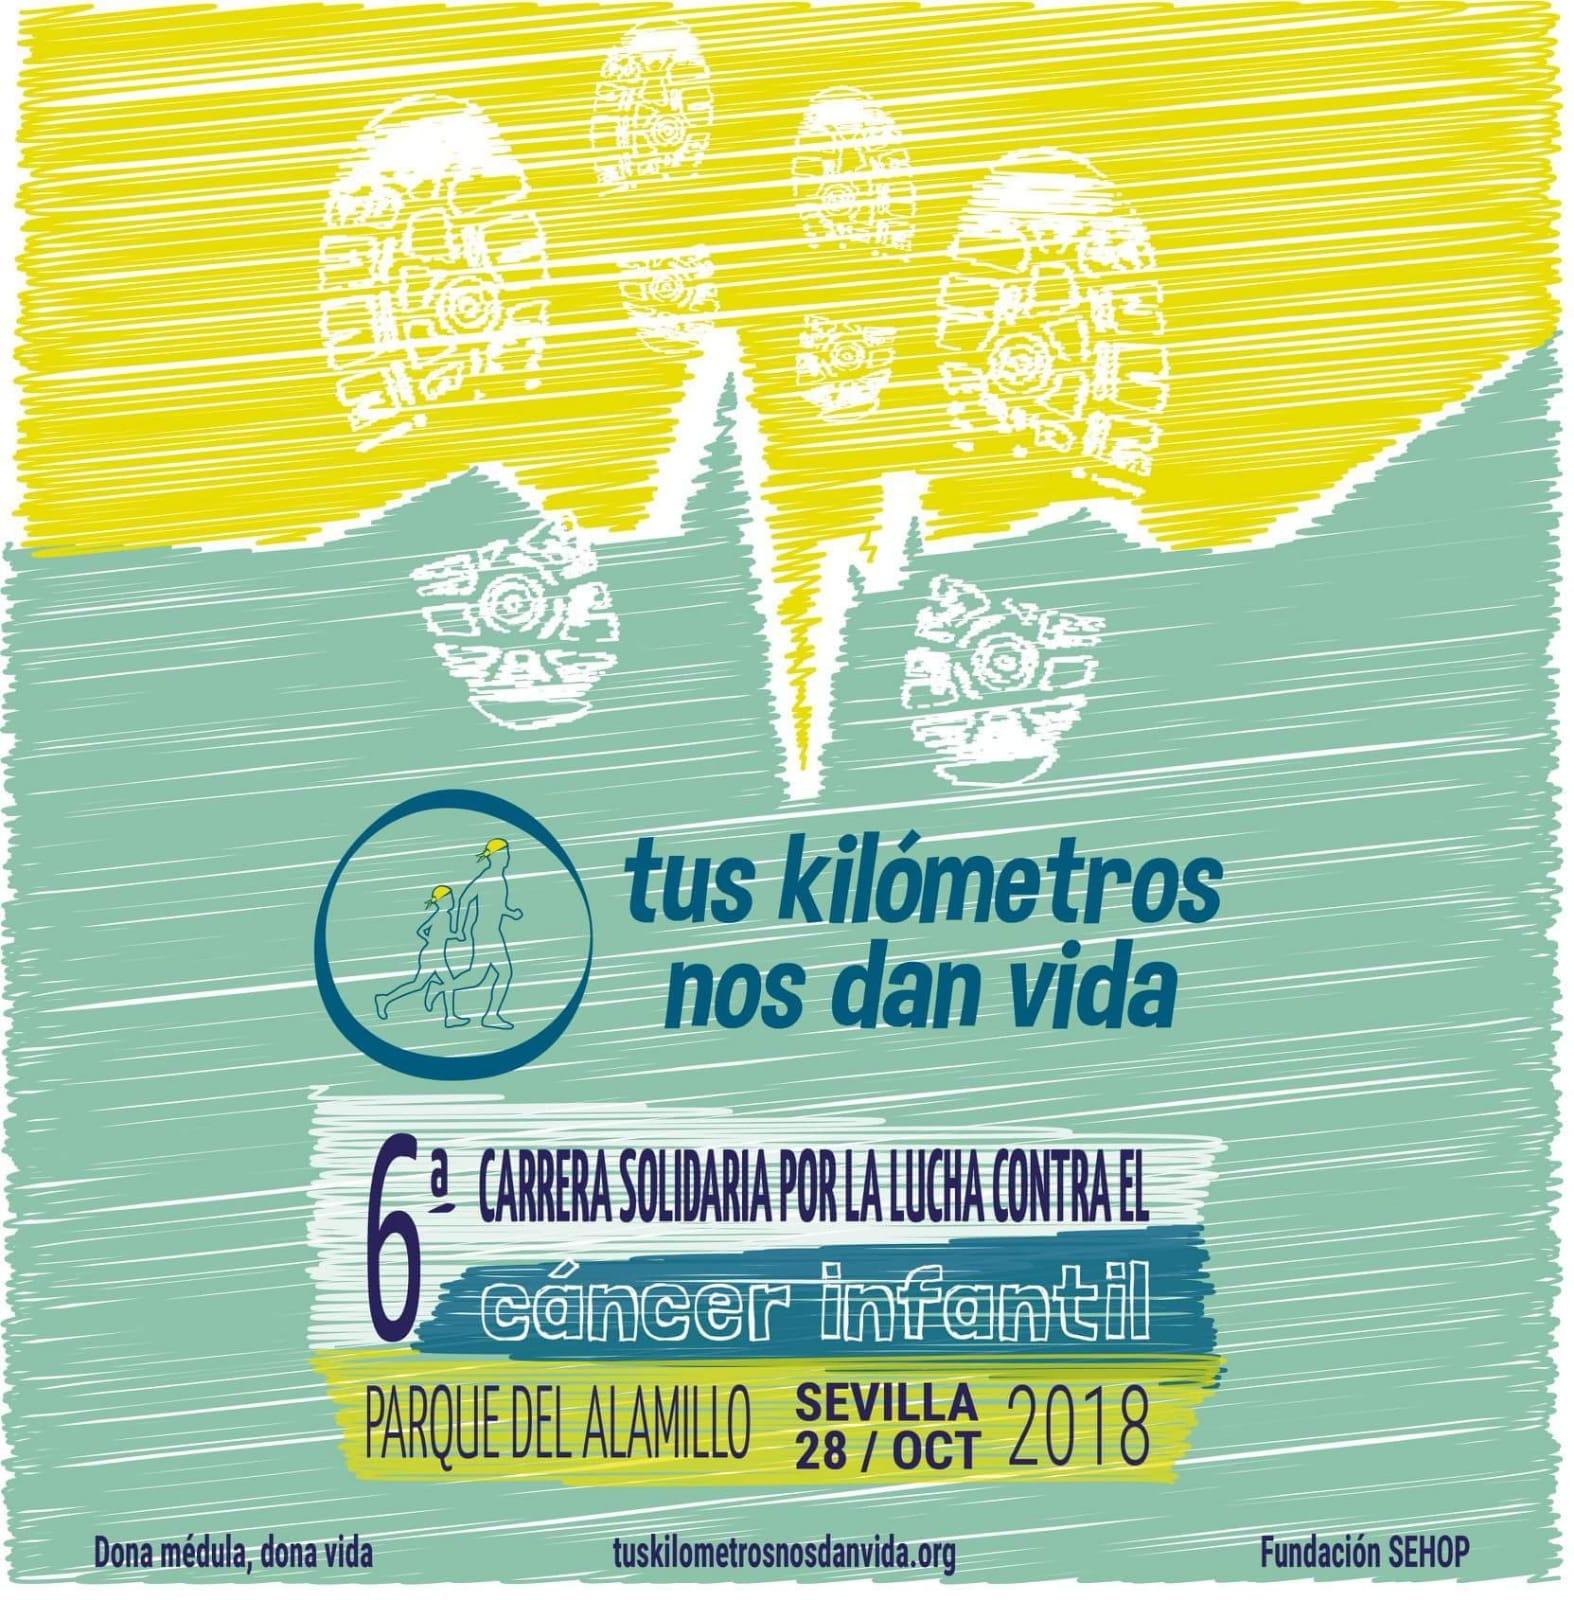 6ª Carrera Solidaria Por La Lucha Contra el Cáncer Infantil - Sprint Chip